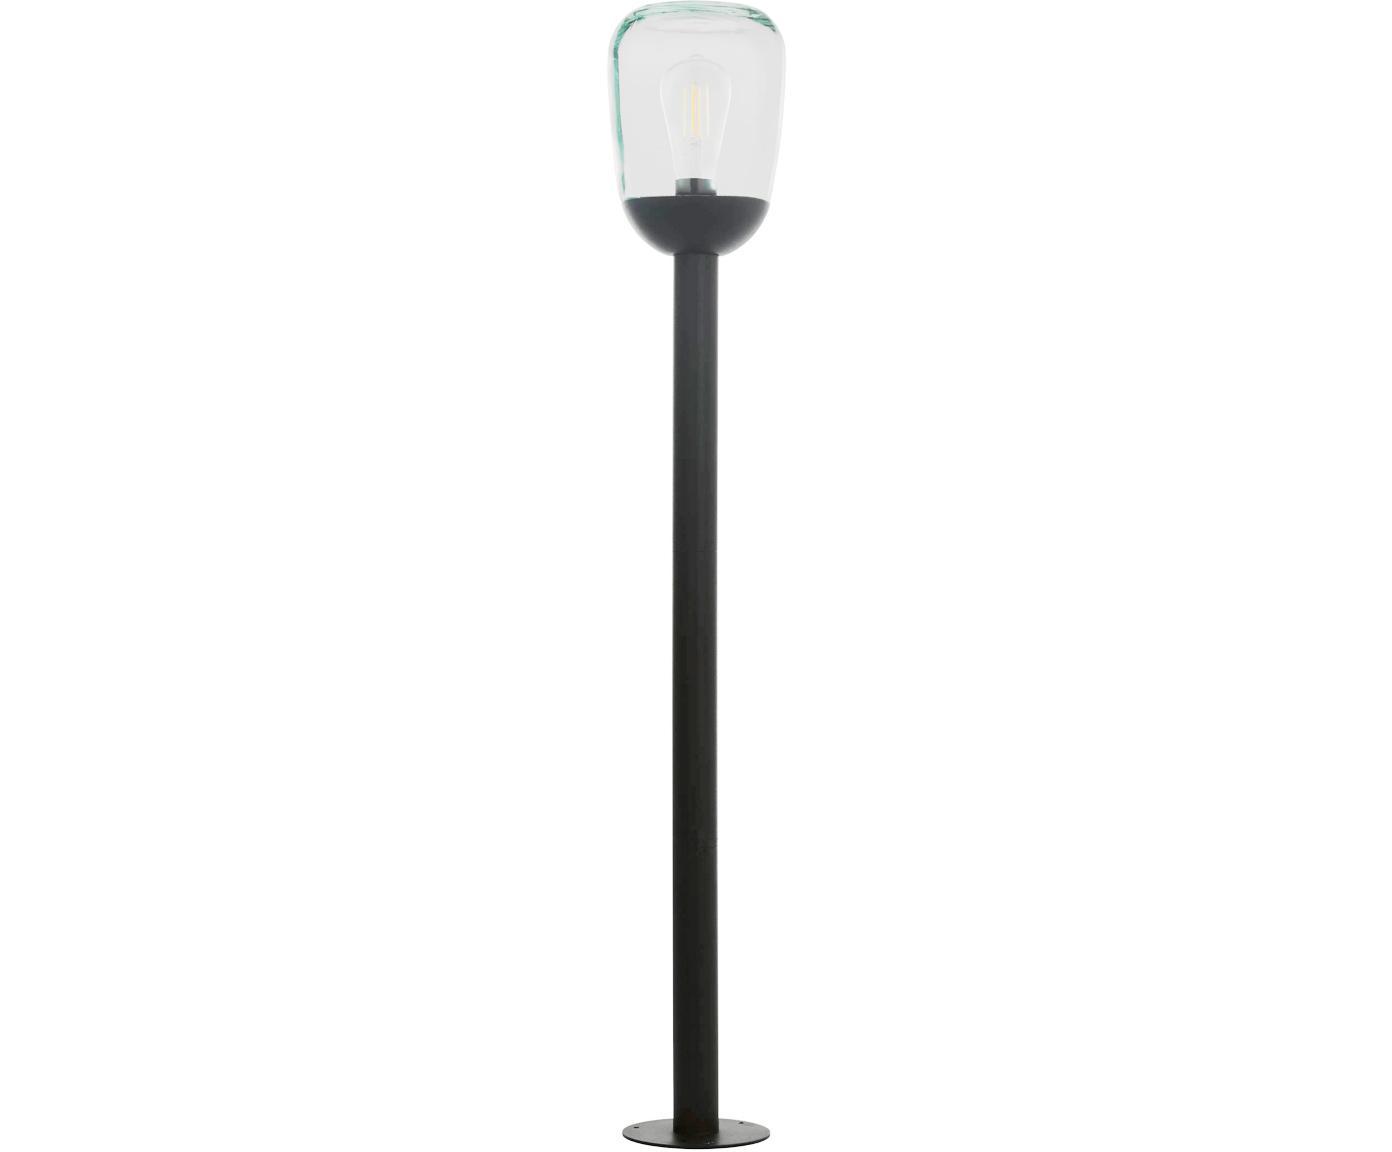 Lámpara de pie para exterior Donatori, Aluminio, vidrio, Negro, Ø 16 x Al 99 cm